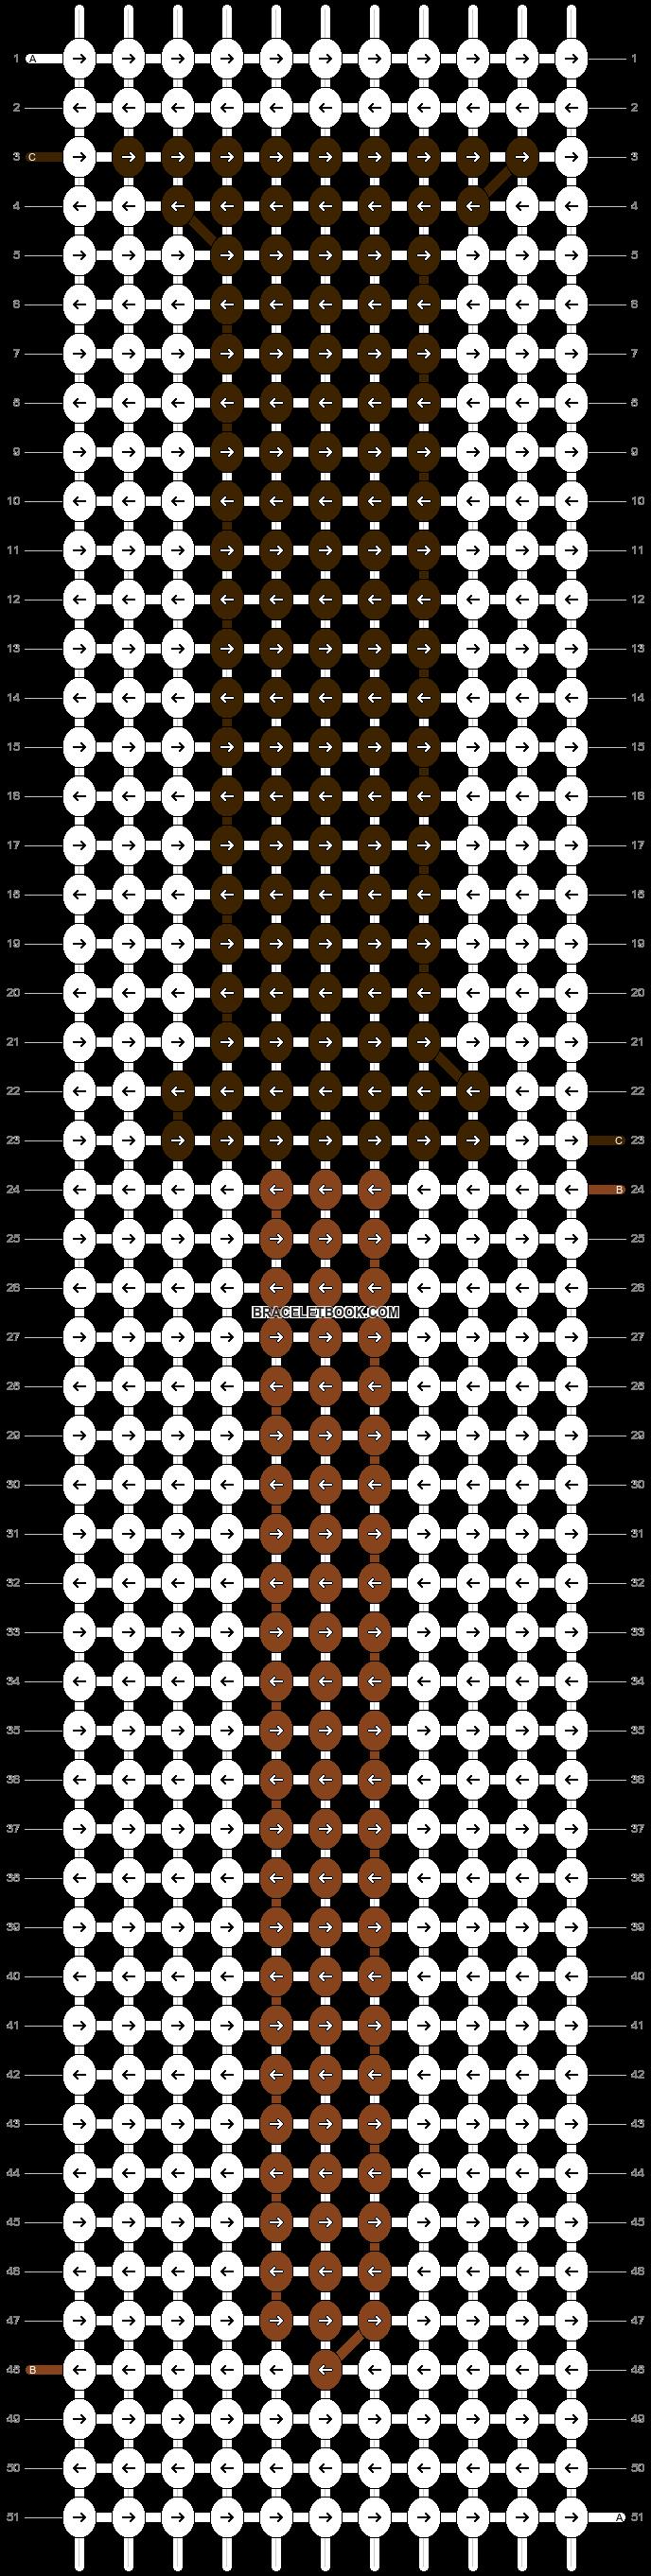 Alpha pattern #47835 pattern